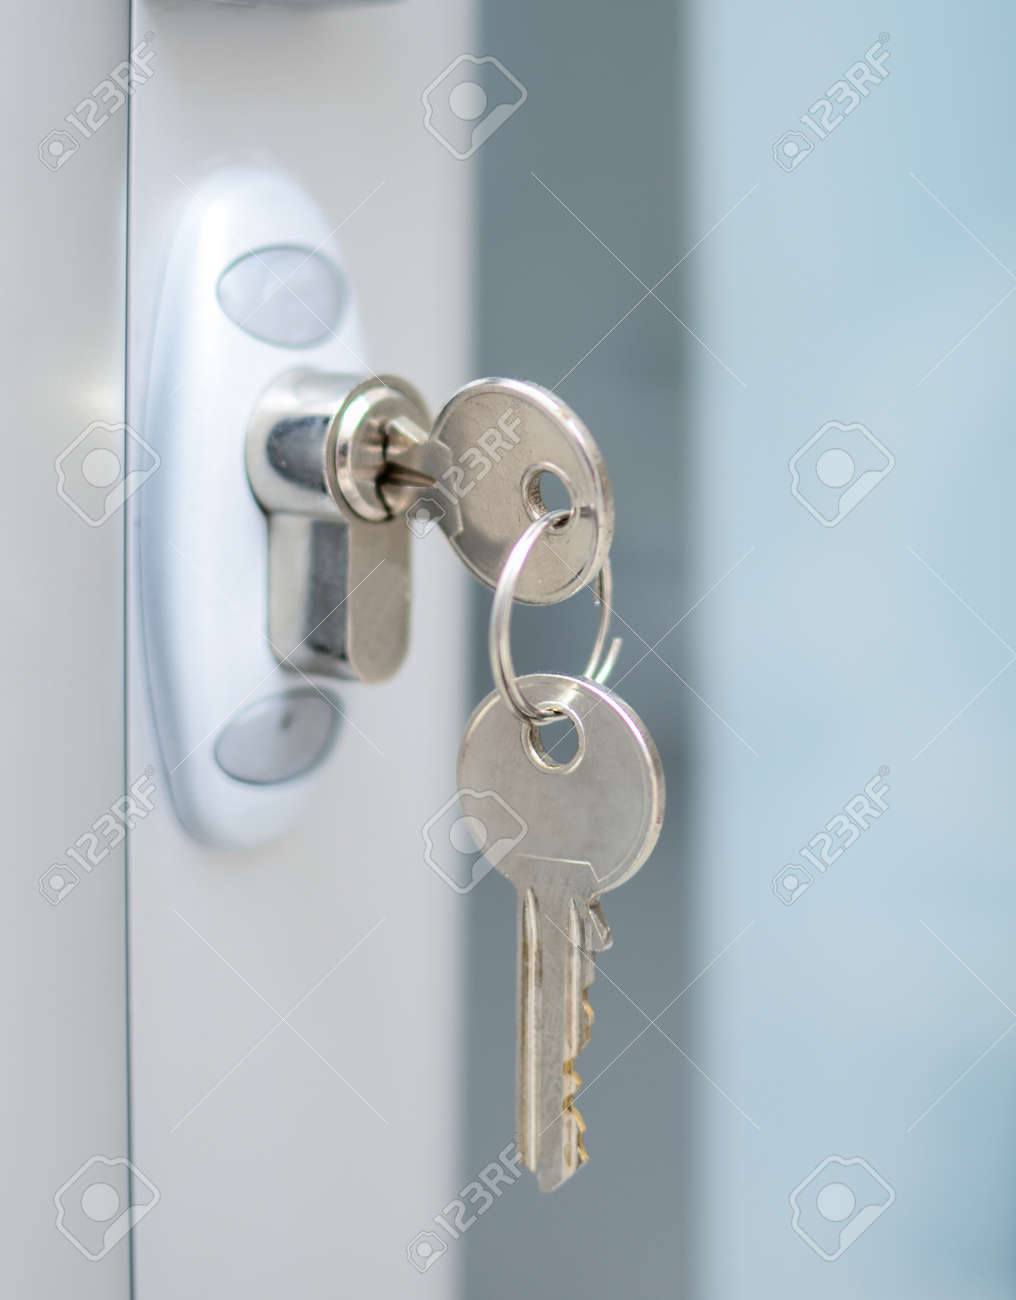 Door lock witj keys macro shot - Real estate concept - 14256149